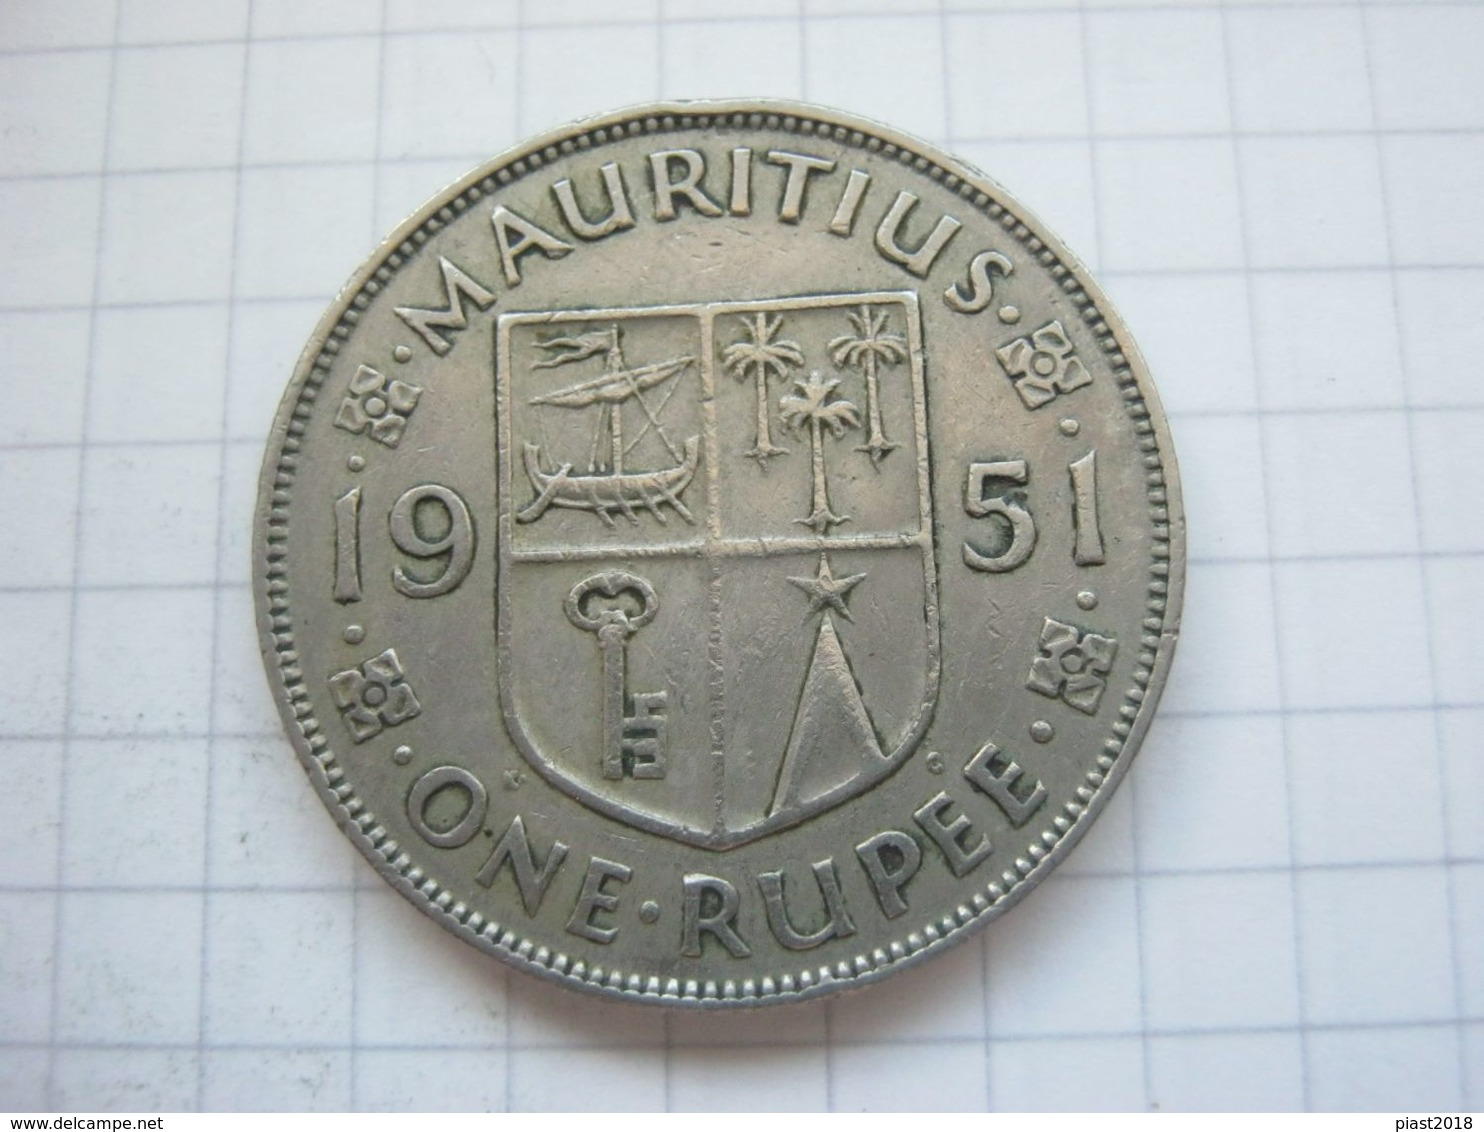 Mauritius , 1 Rupee 1951 - Maurice